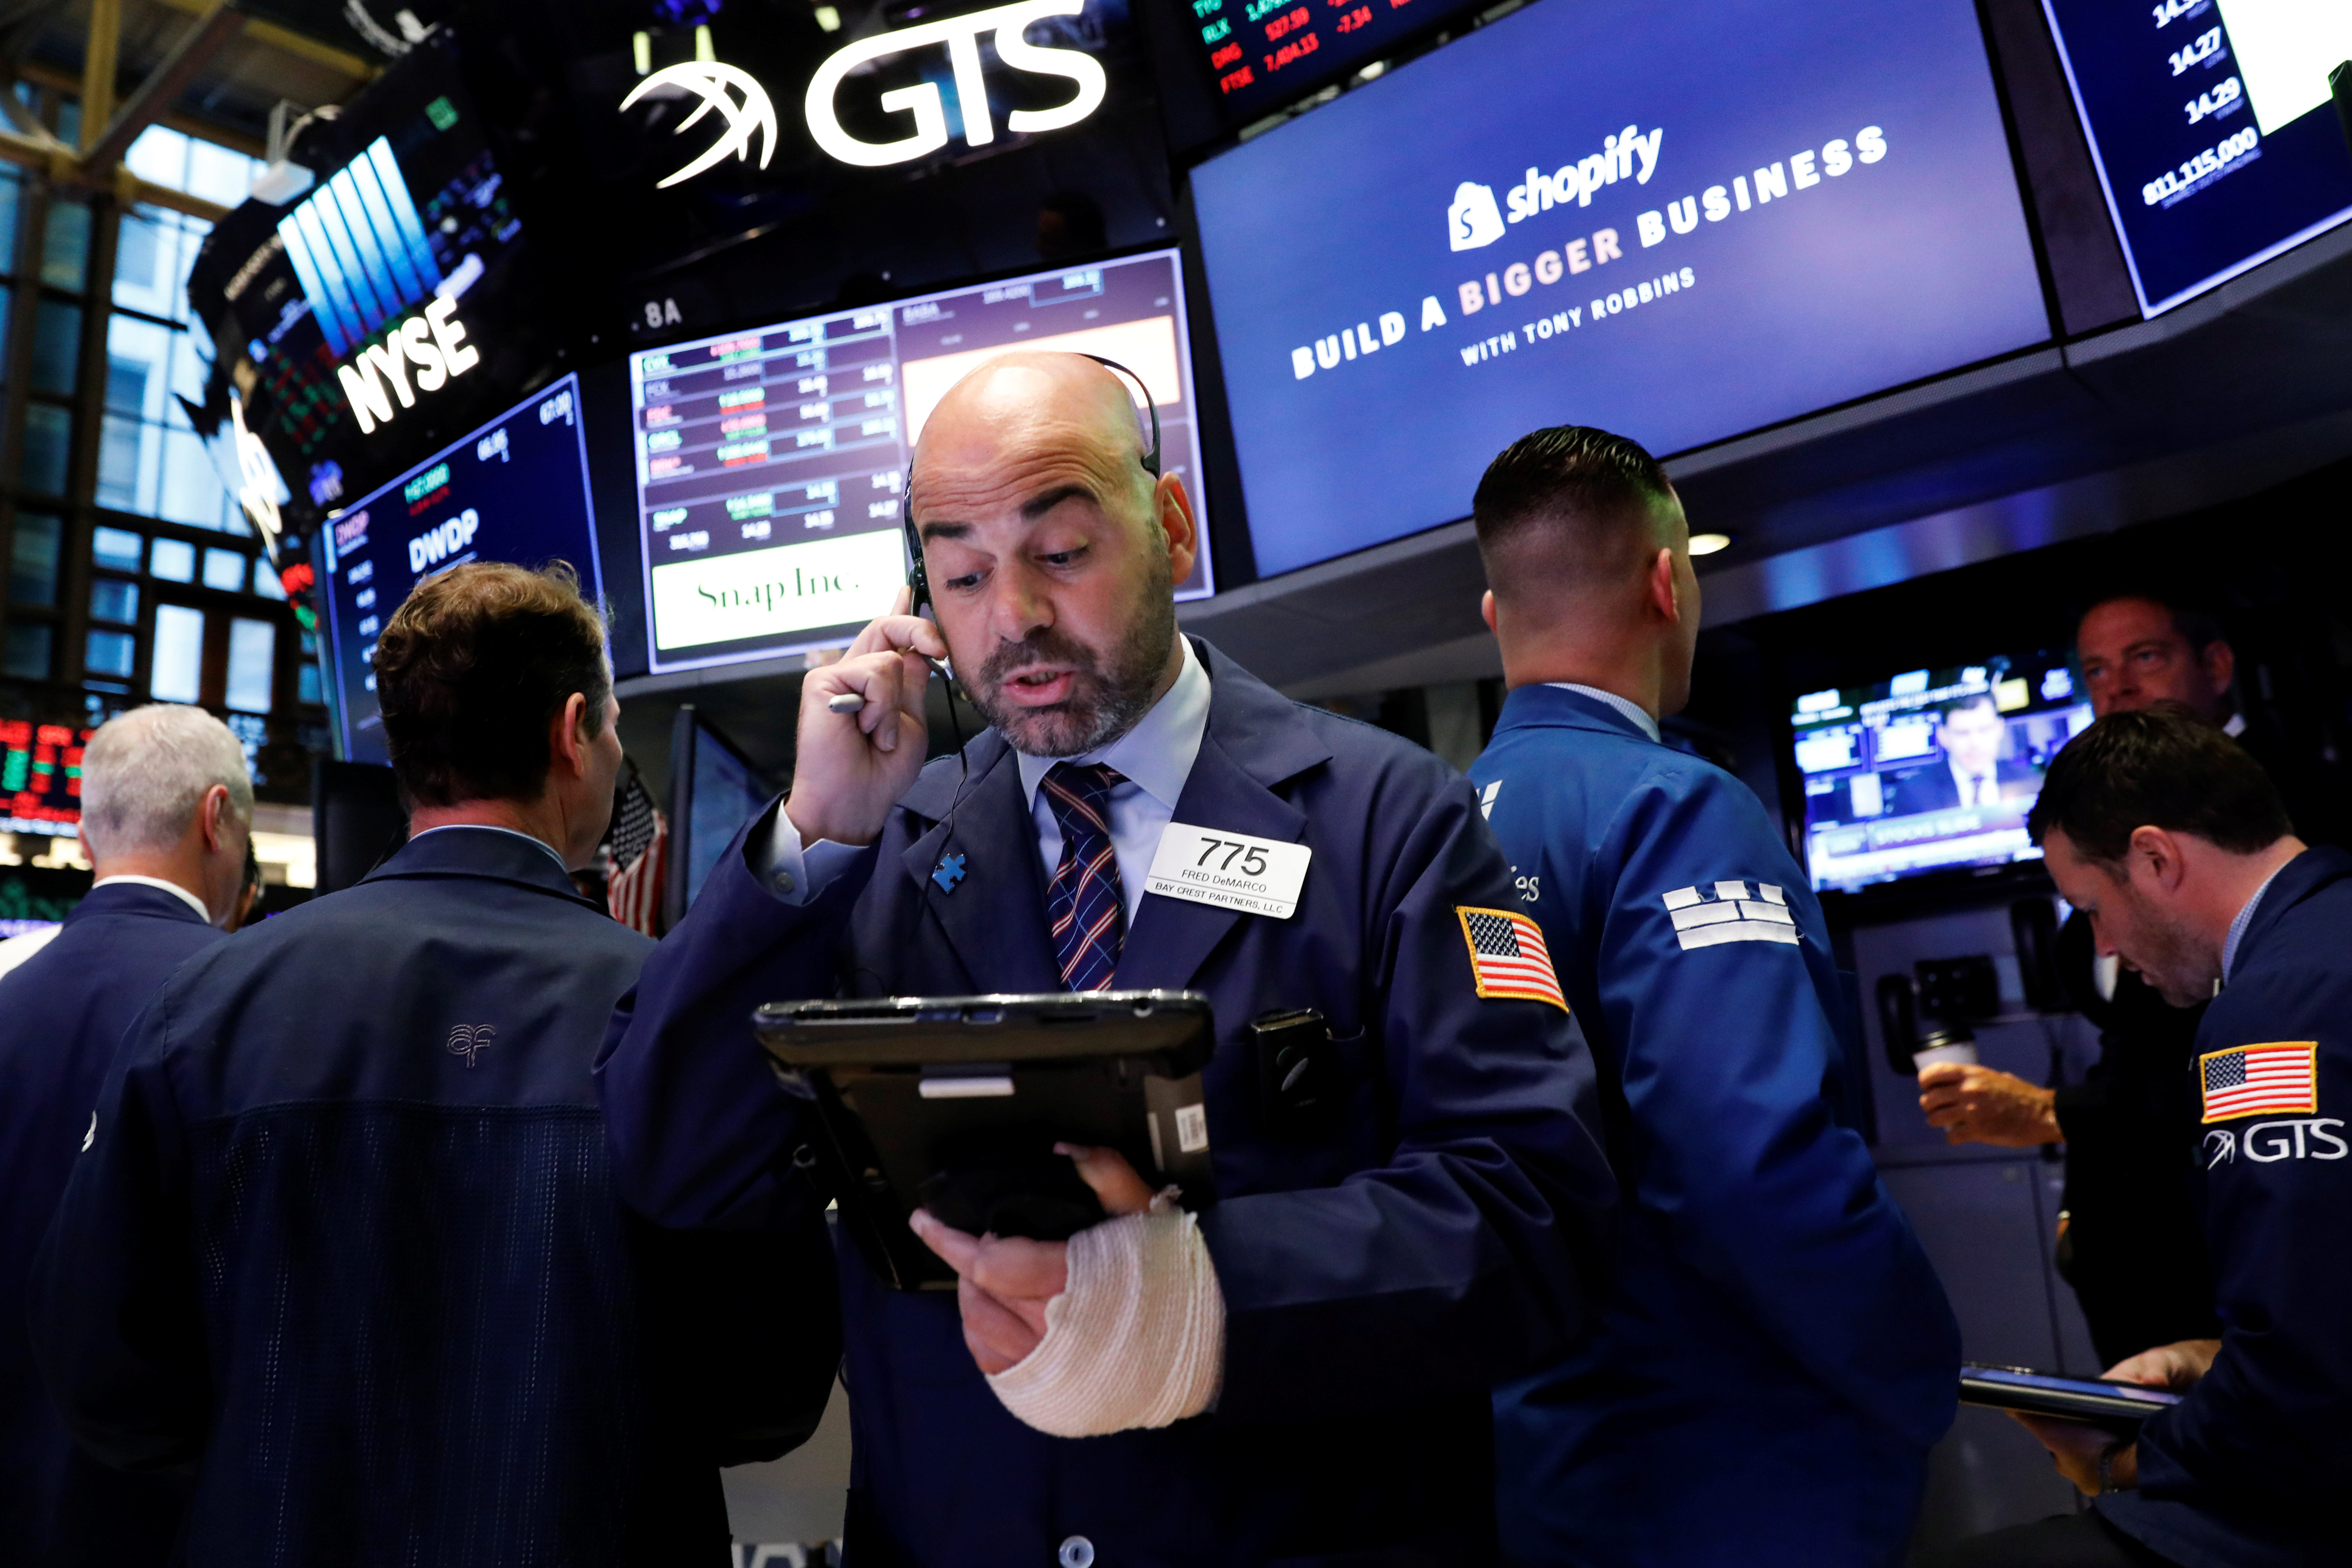 Traders work on the floor of the New York Stock Exchange (NYSE) in New York, U.S., September 5, 2017. REUTERS/Brendan McDermid